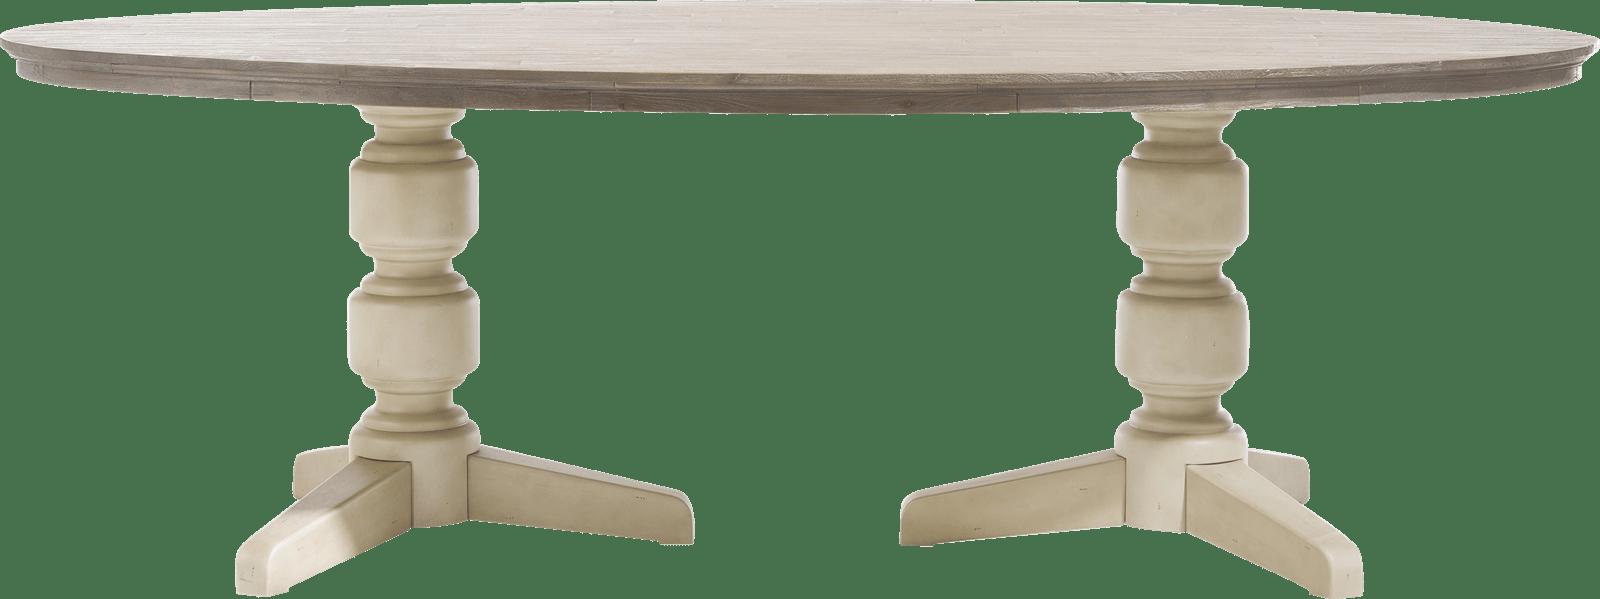 Le Port - tisch oval 240 x 120 cm